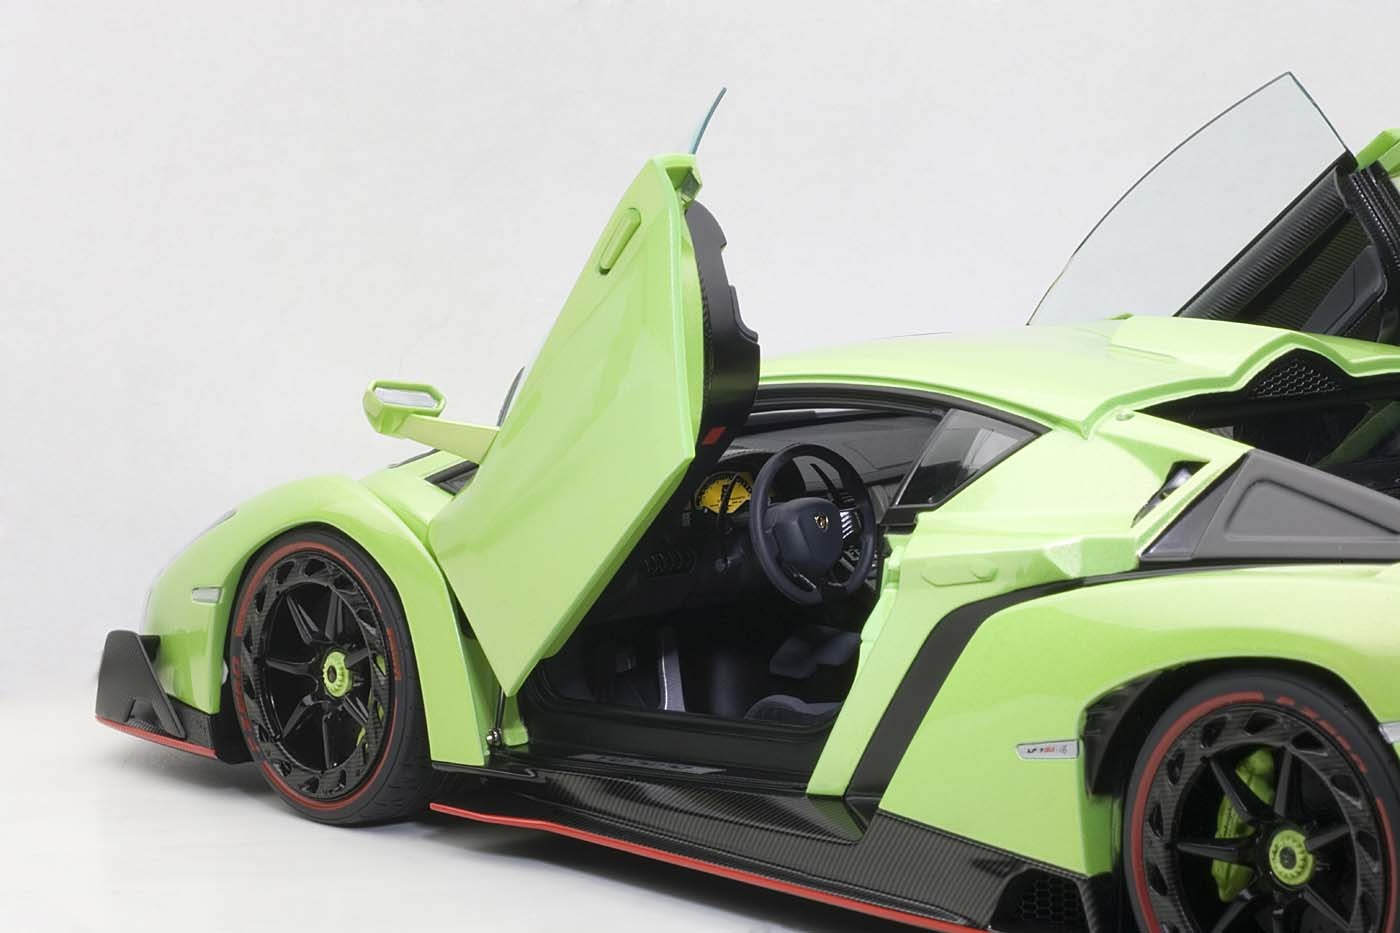 Lamborghini Veneno For Sale >> AUTOart Highly detailed die-cast model Green Lamborghini Veneno 74509 1:18 Scale Item: AU74509 ...